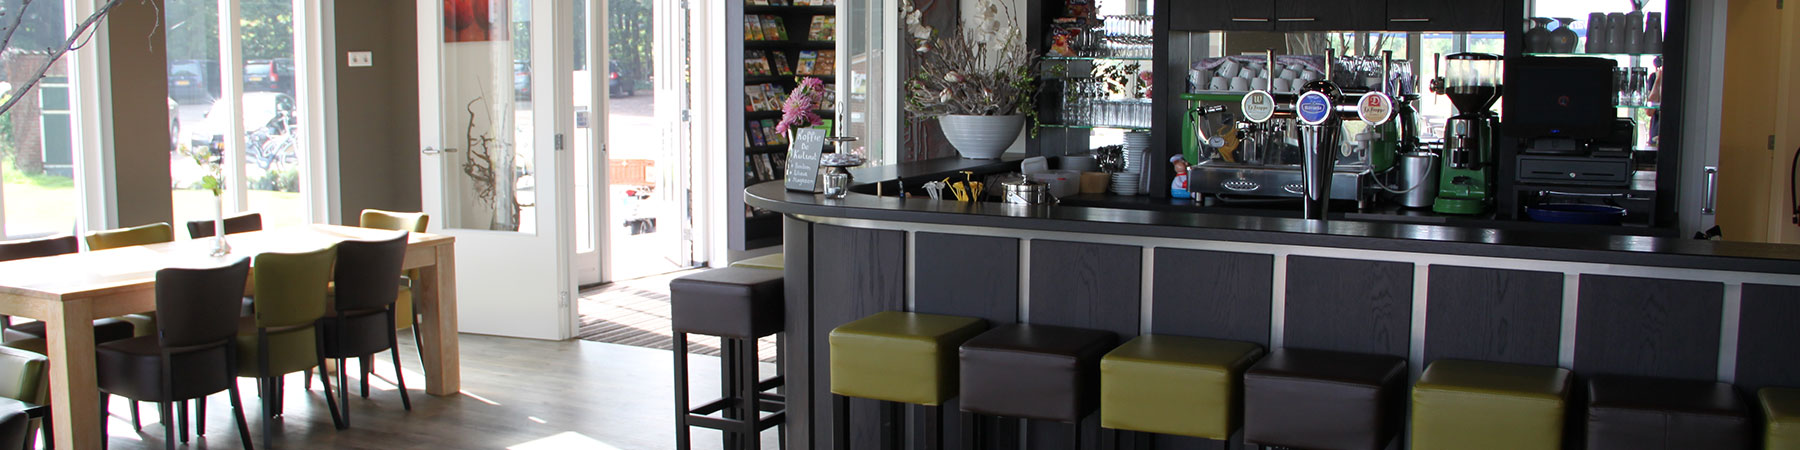 brasserie-de-kuluut-overloon2